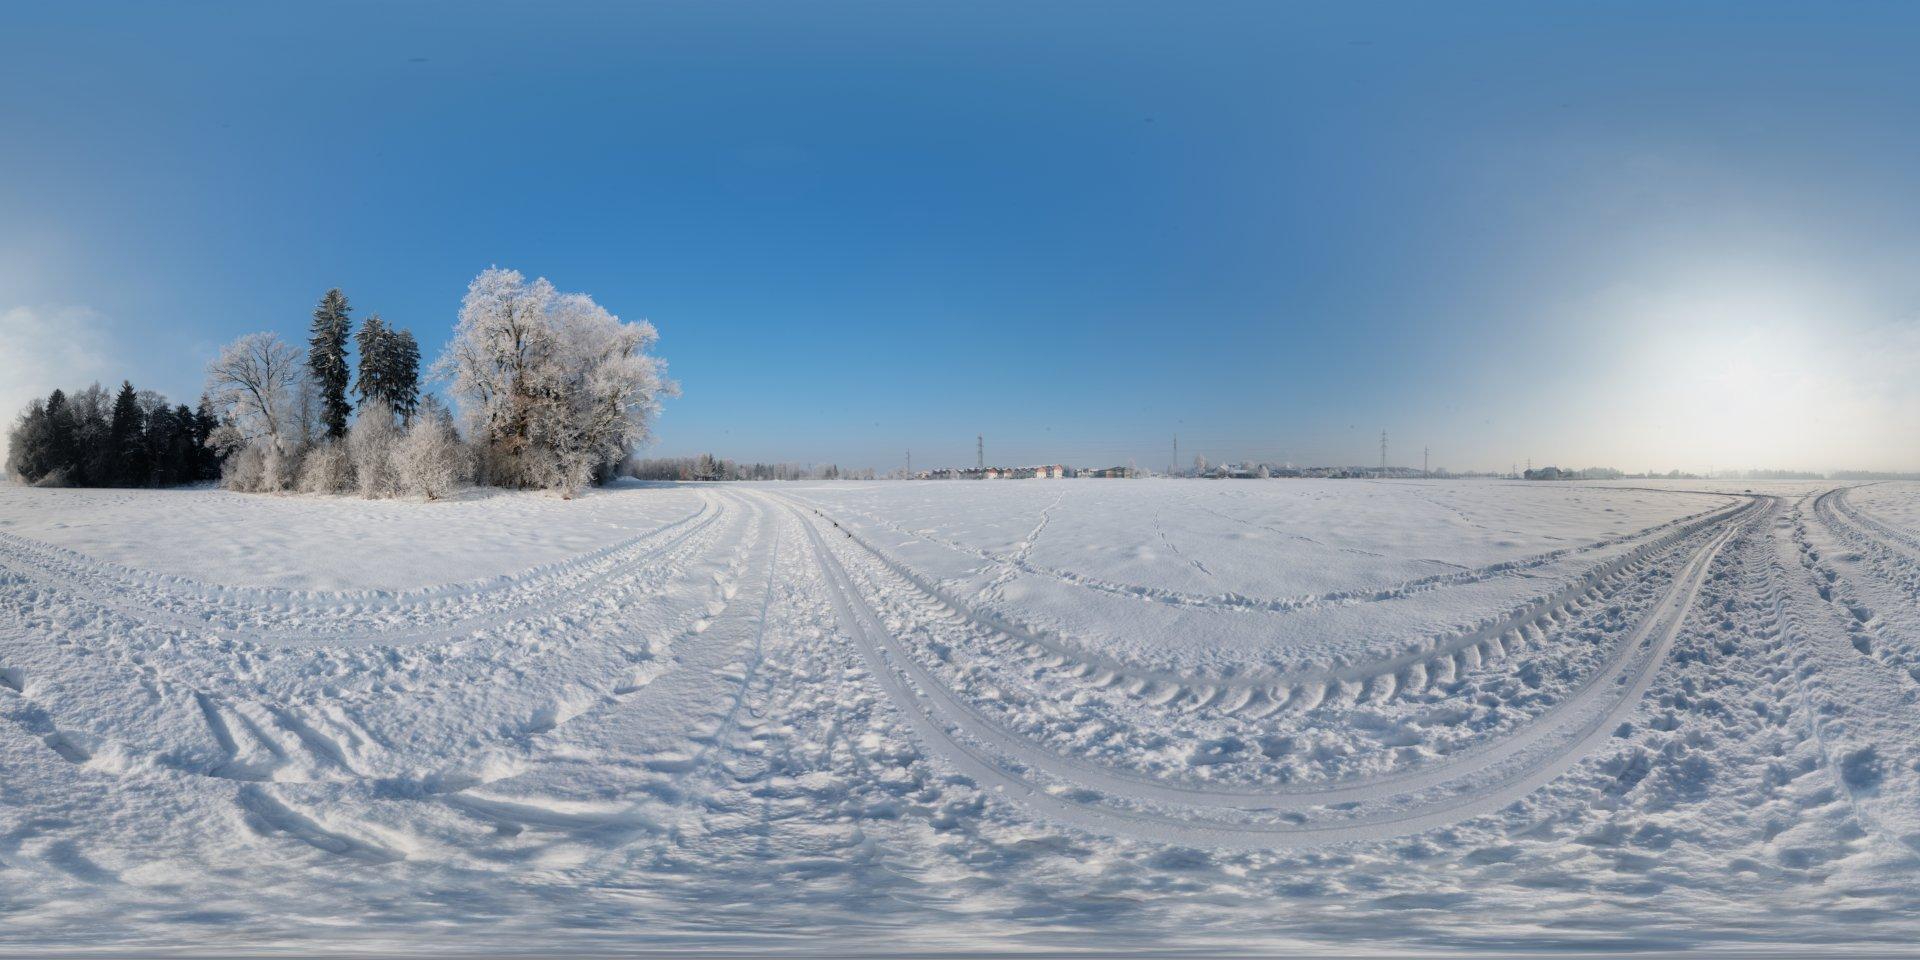 Hdri 360 176 Snowfield Morning Openfootage